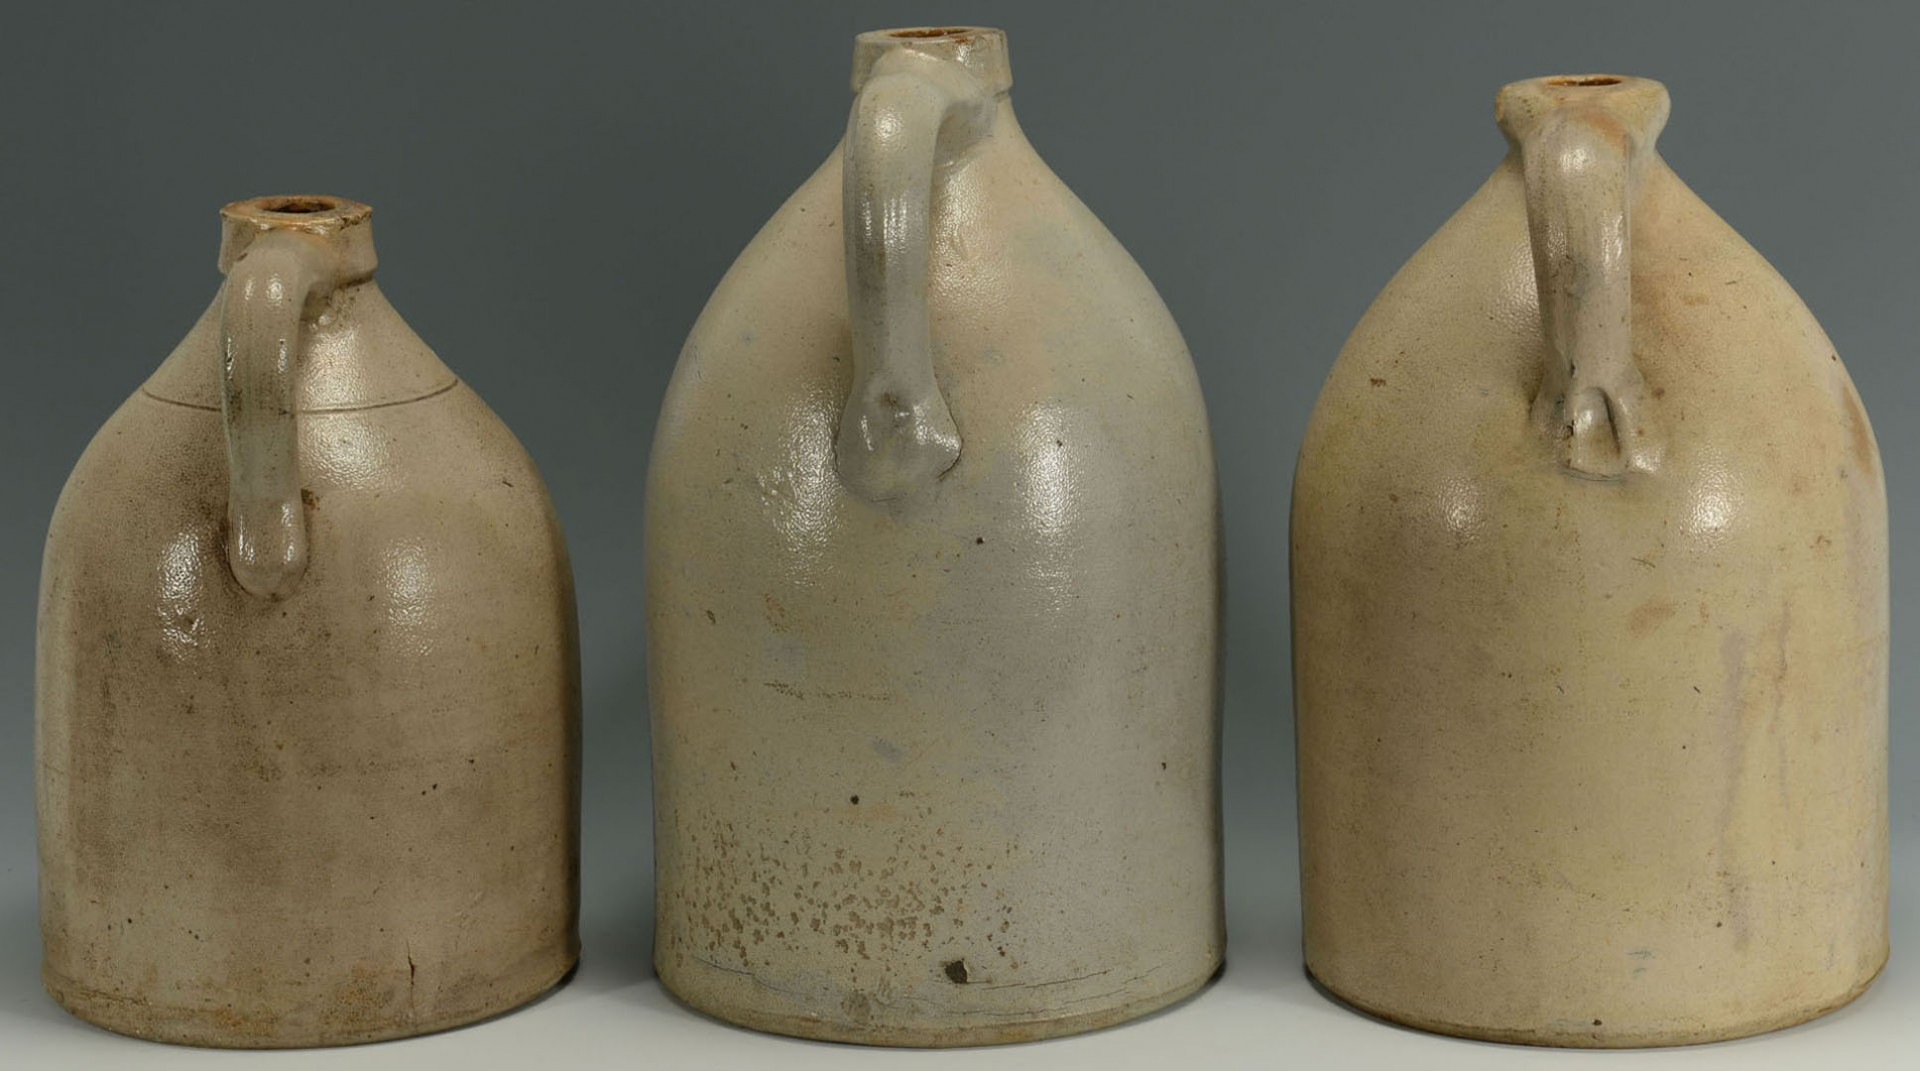 Lot 2872351: 3 Cobalt Decorated Stoneware Jugs